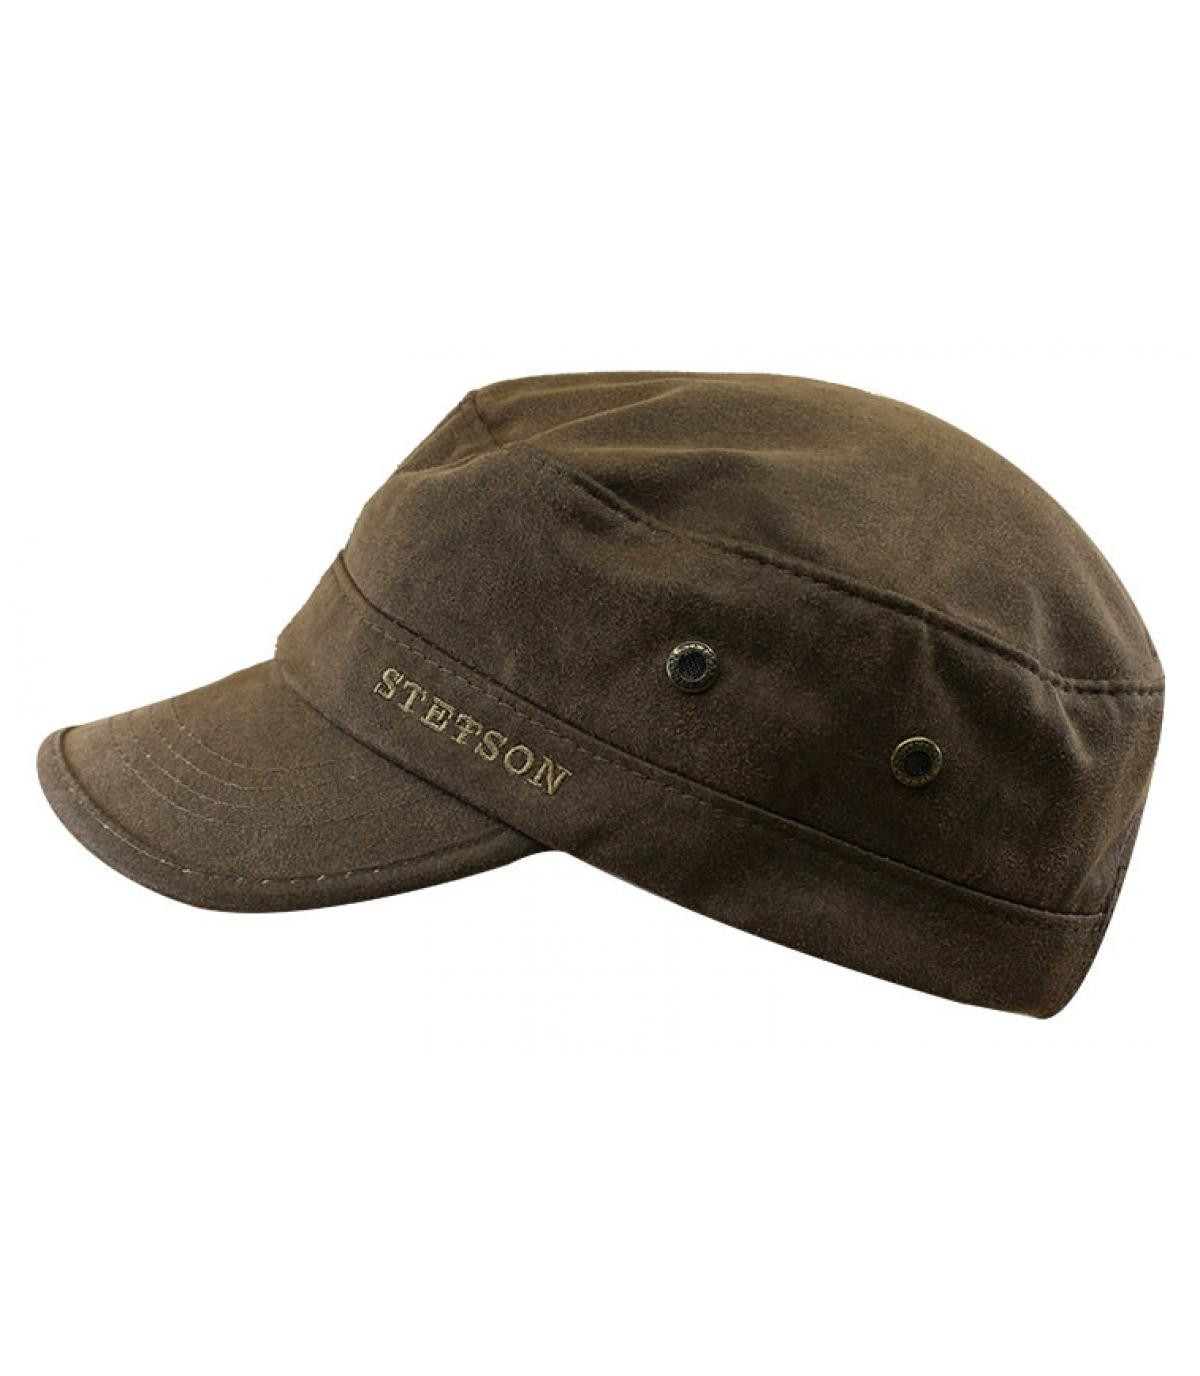 brown cotton army cap